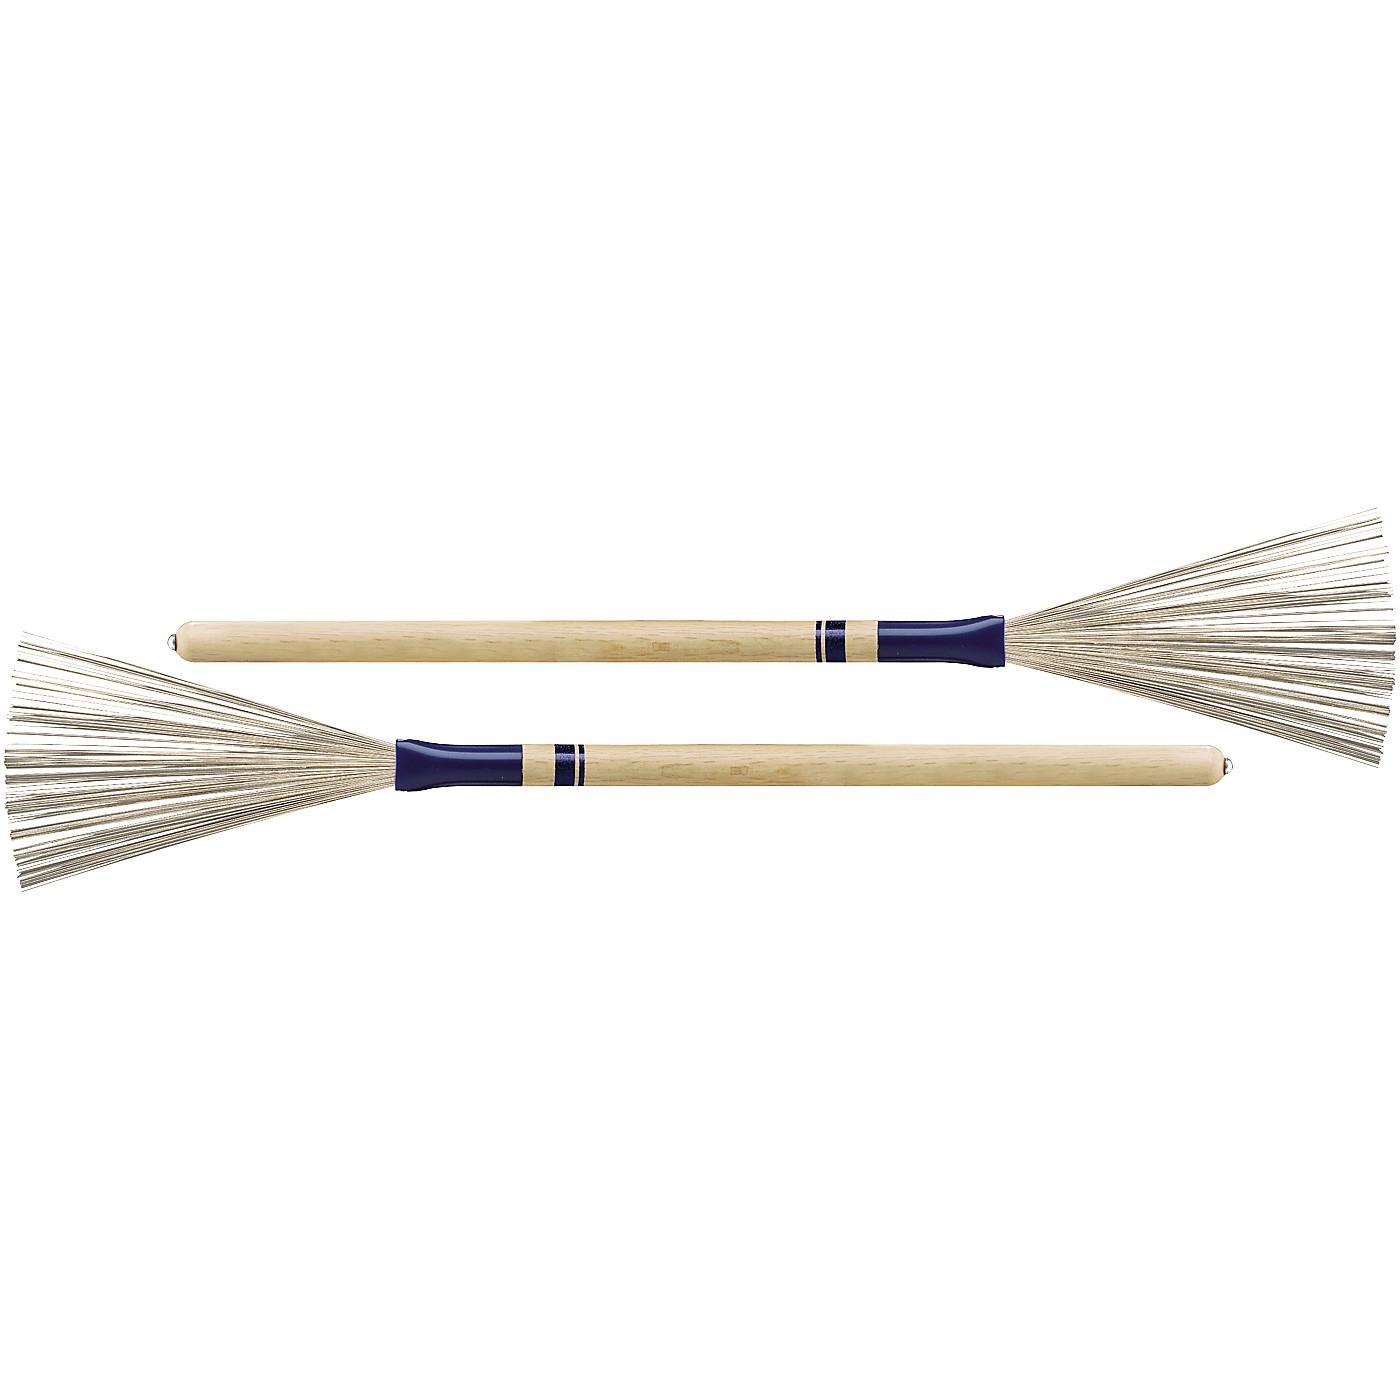 Promark B300 Accent Brush With Oak Handle thumbnail